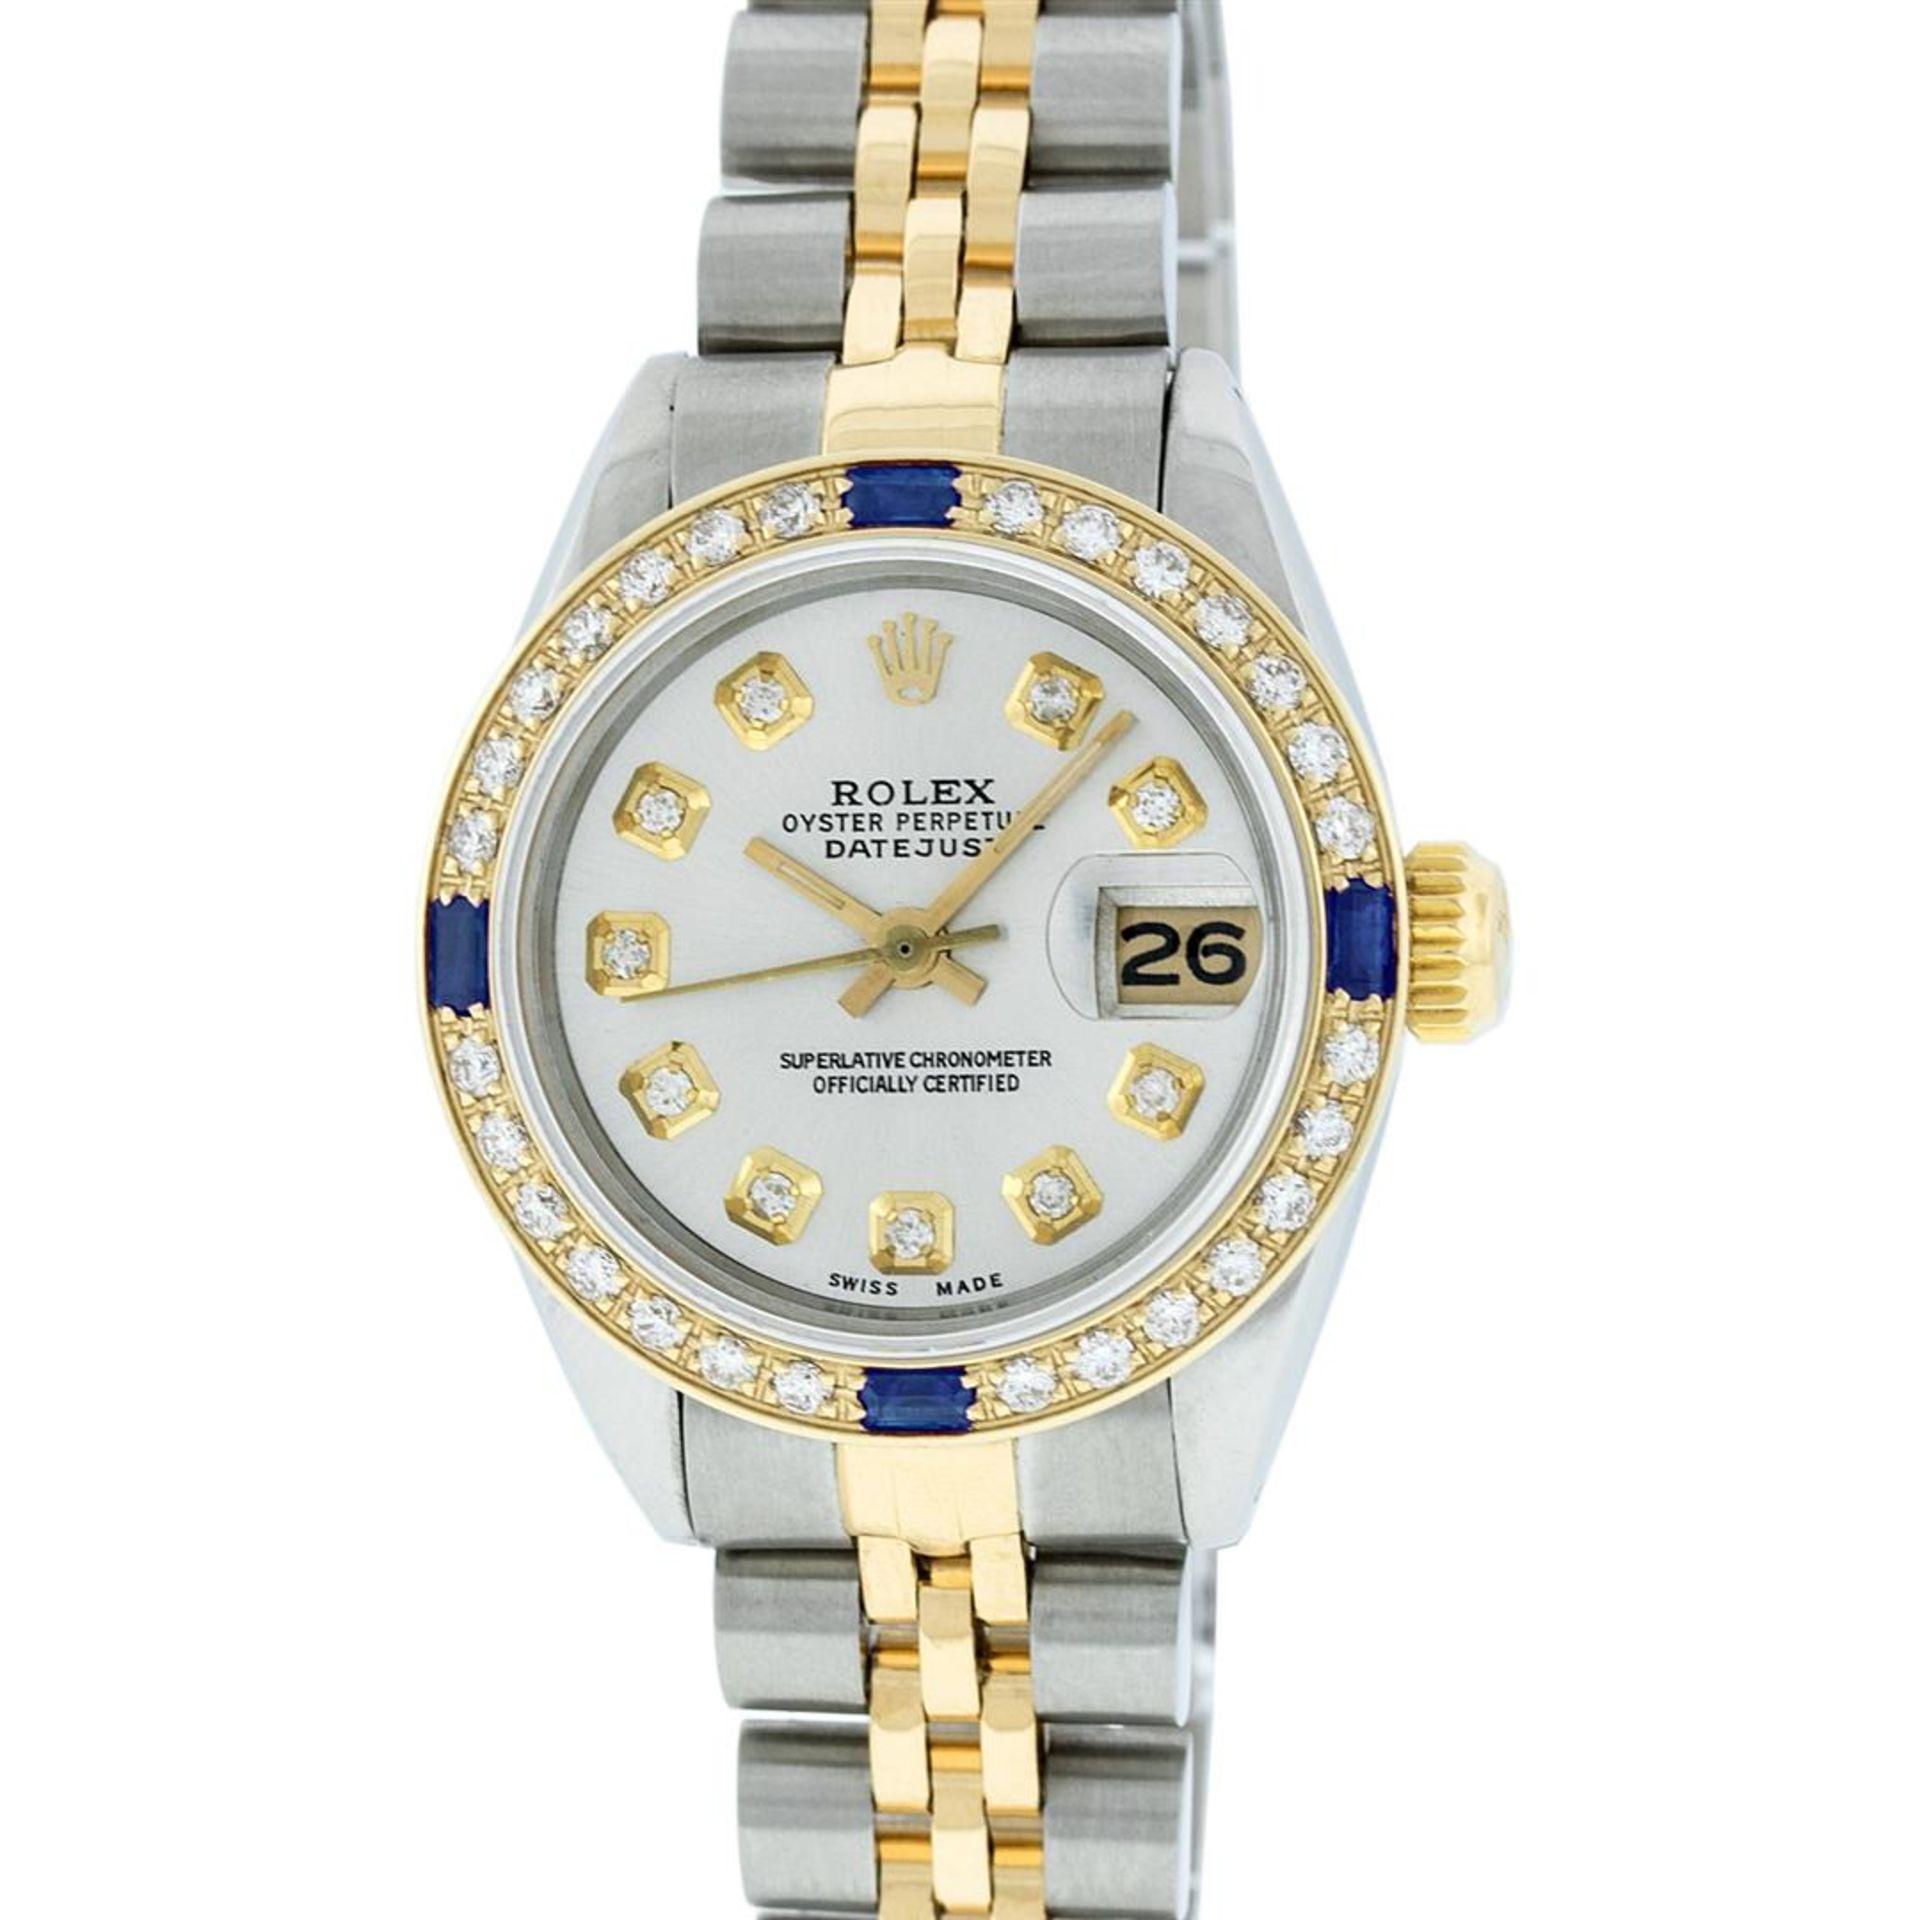 Rolex Ladies 2 Tone Silver Diamond & Sapphire Datejust Wristwatch - Image 3 of 9